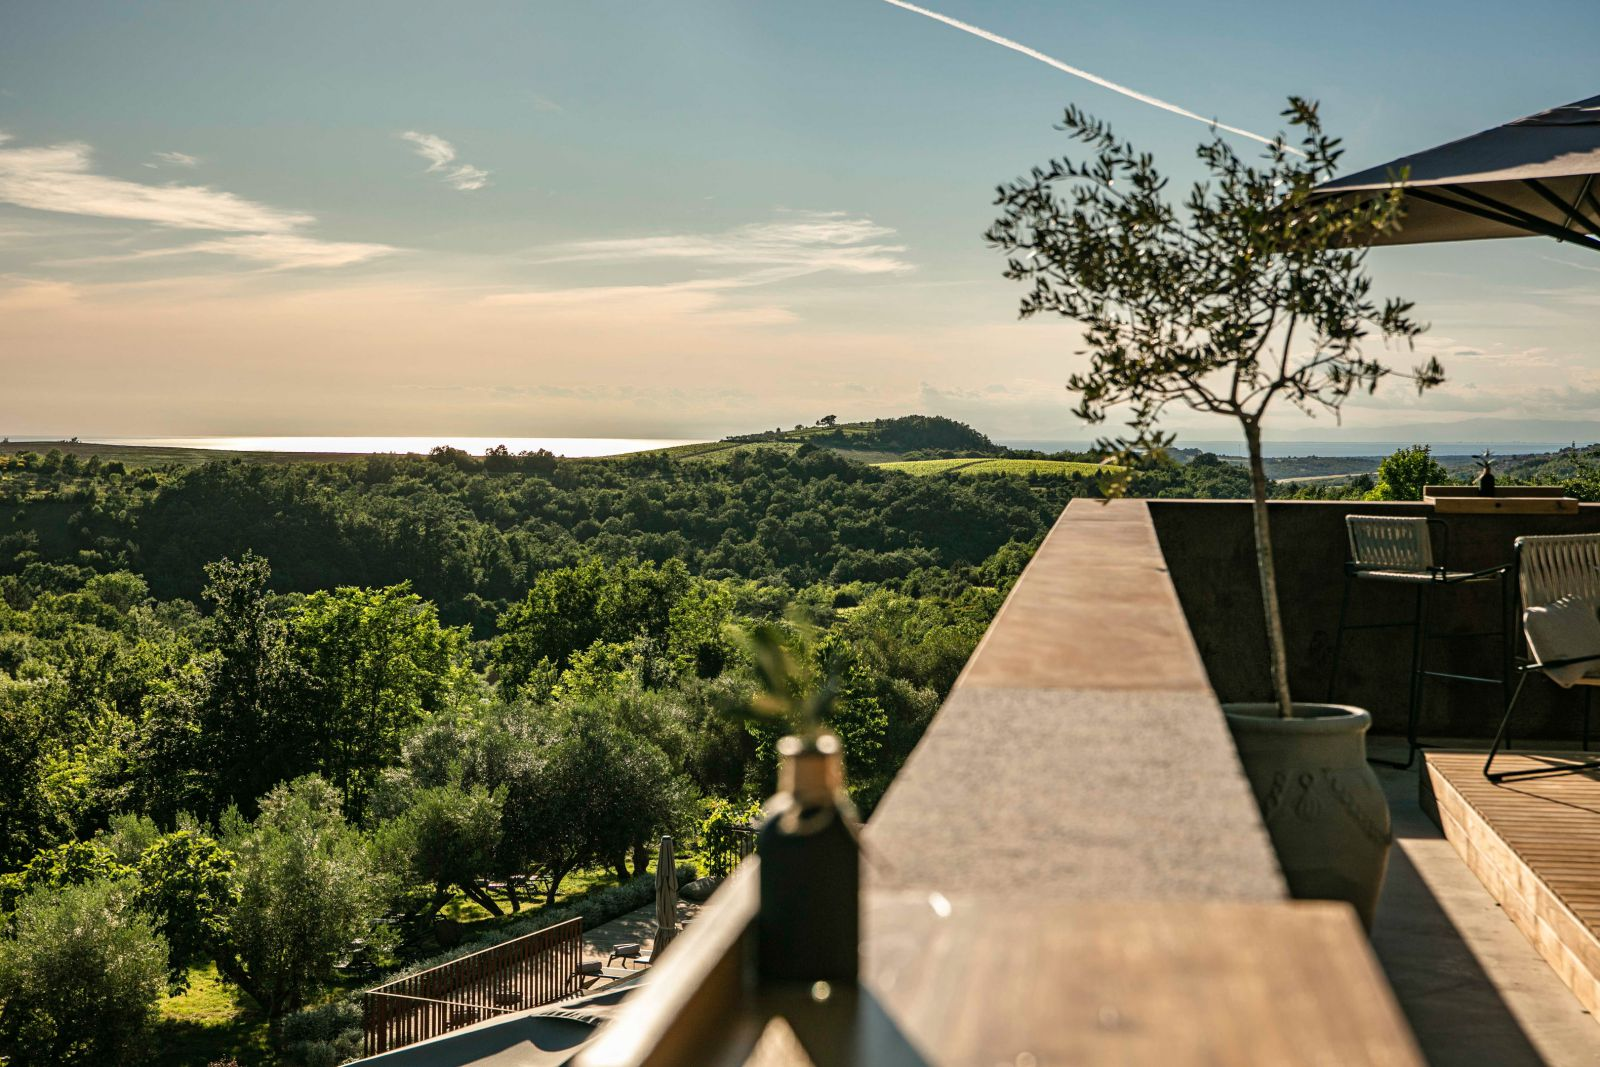 San Canzaian village & hotel, Istria, Croatia, photo credit by San Canzian